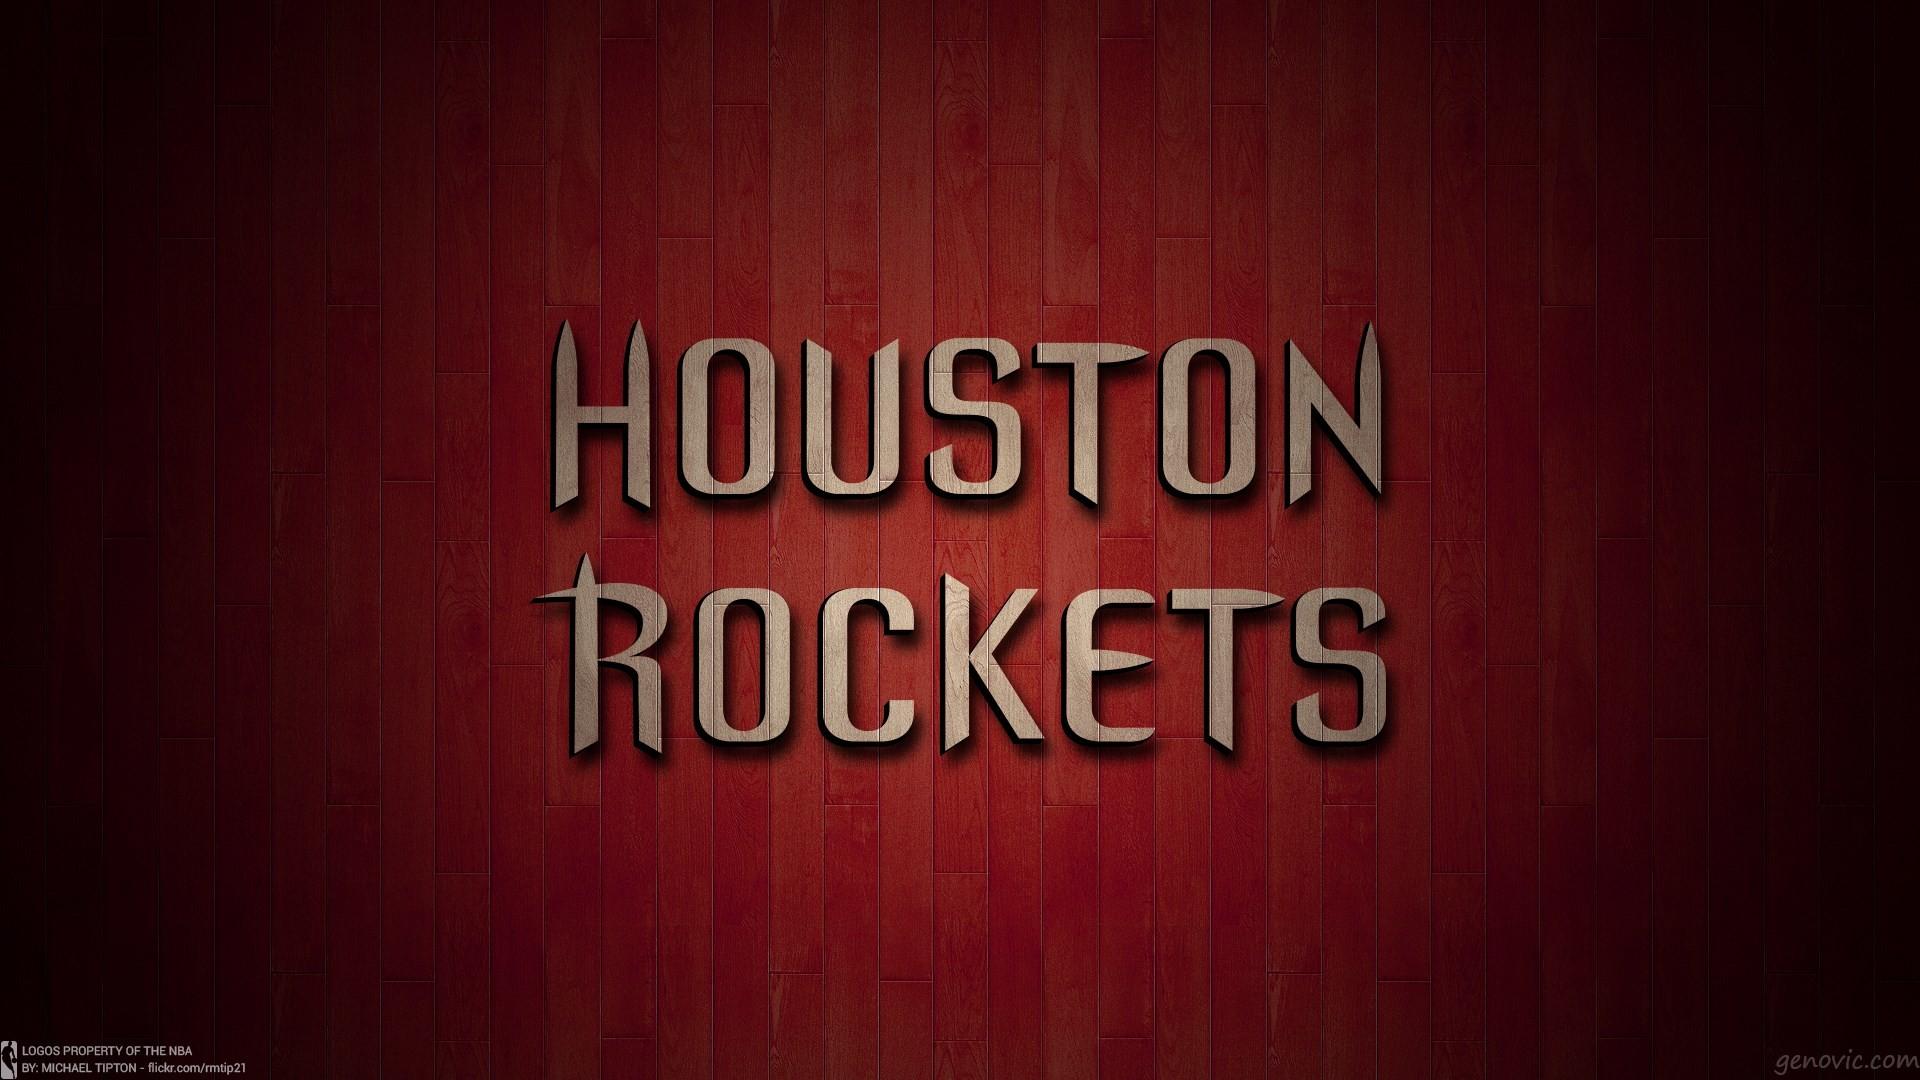 Rockets Wallpaper | Houston Rockets | Images Wallpapers | Pinterest |  Wallpaper